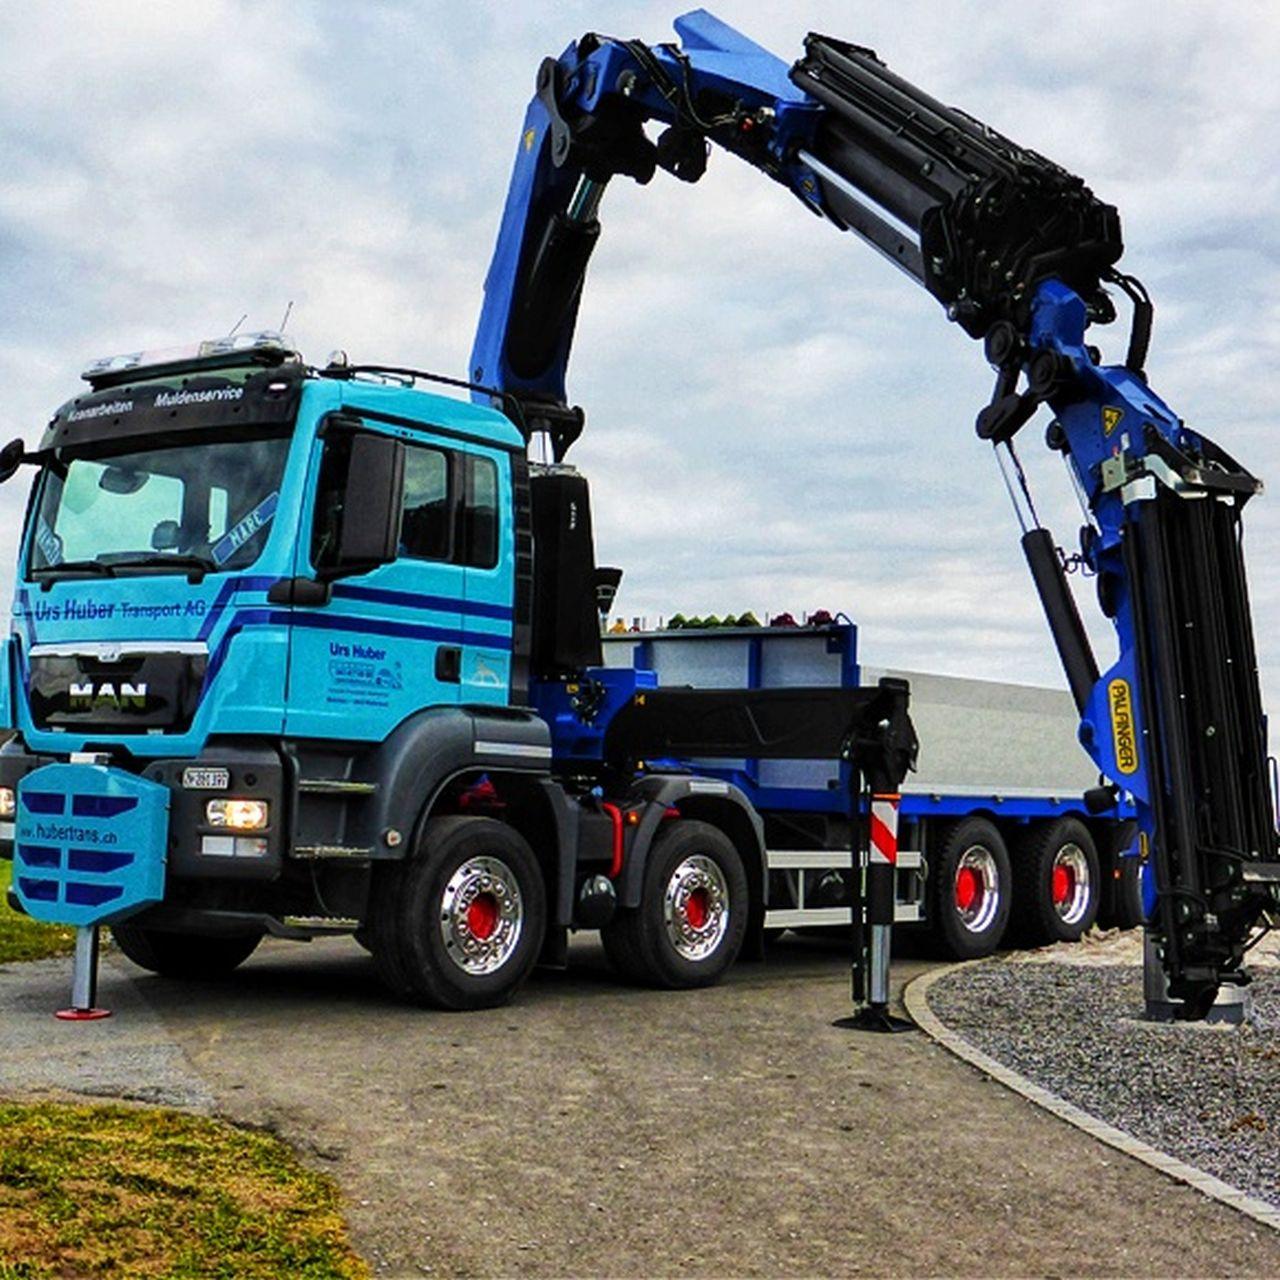 5-Achs-Kranwagen_35m_Urs Huber Transport AG 3-01[1]